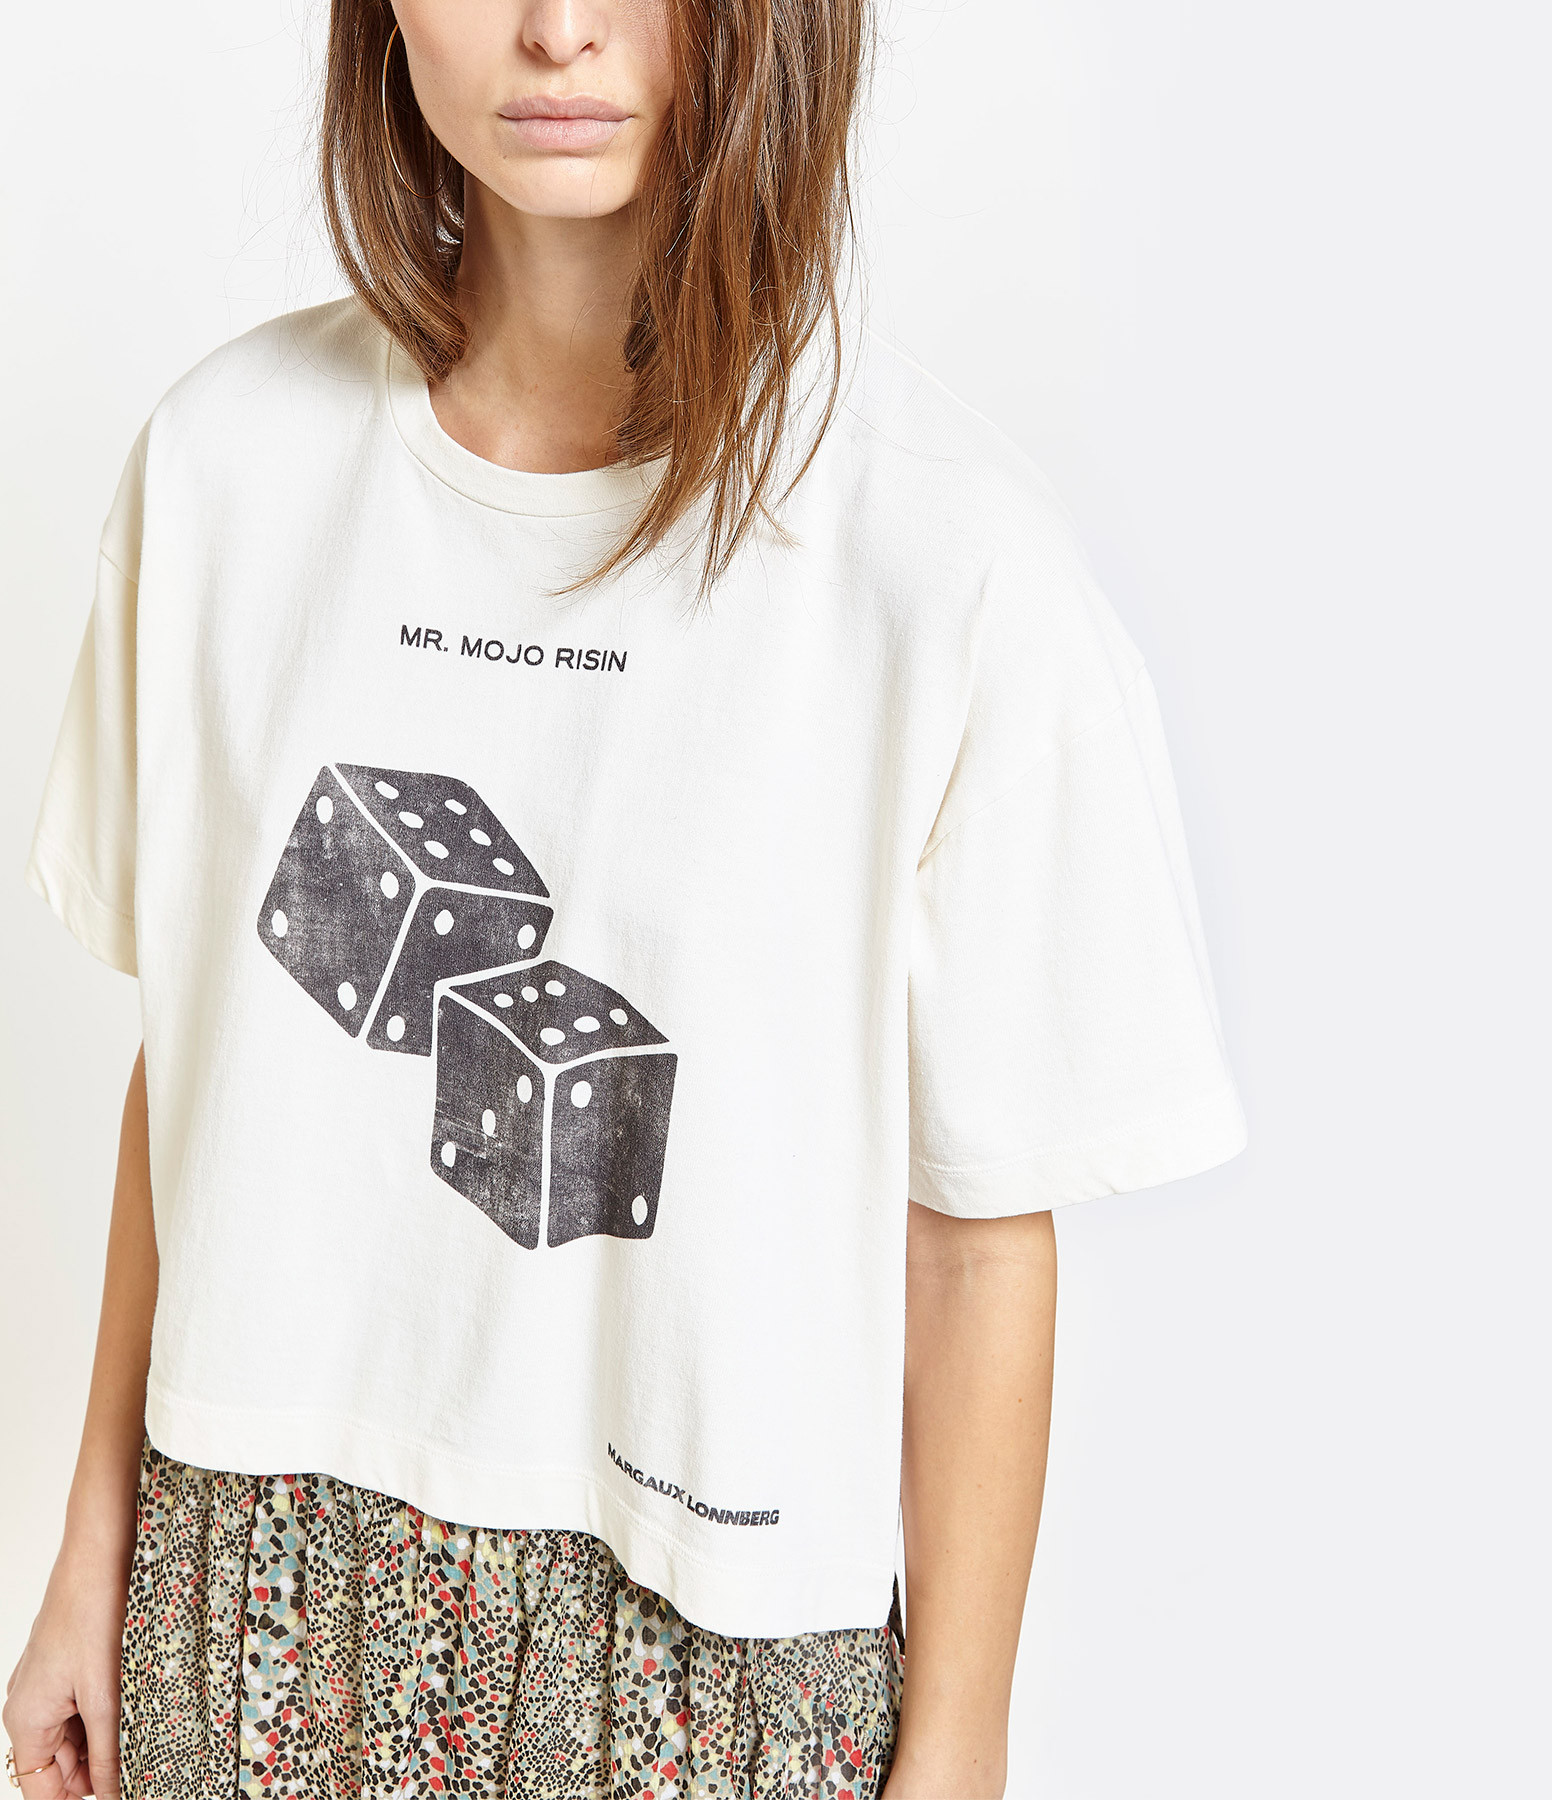 MARGAUX LONNBERG - Tee-shirt Brisa Mojo Imprimé Blanc